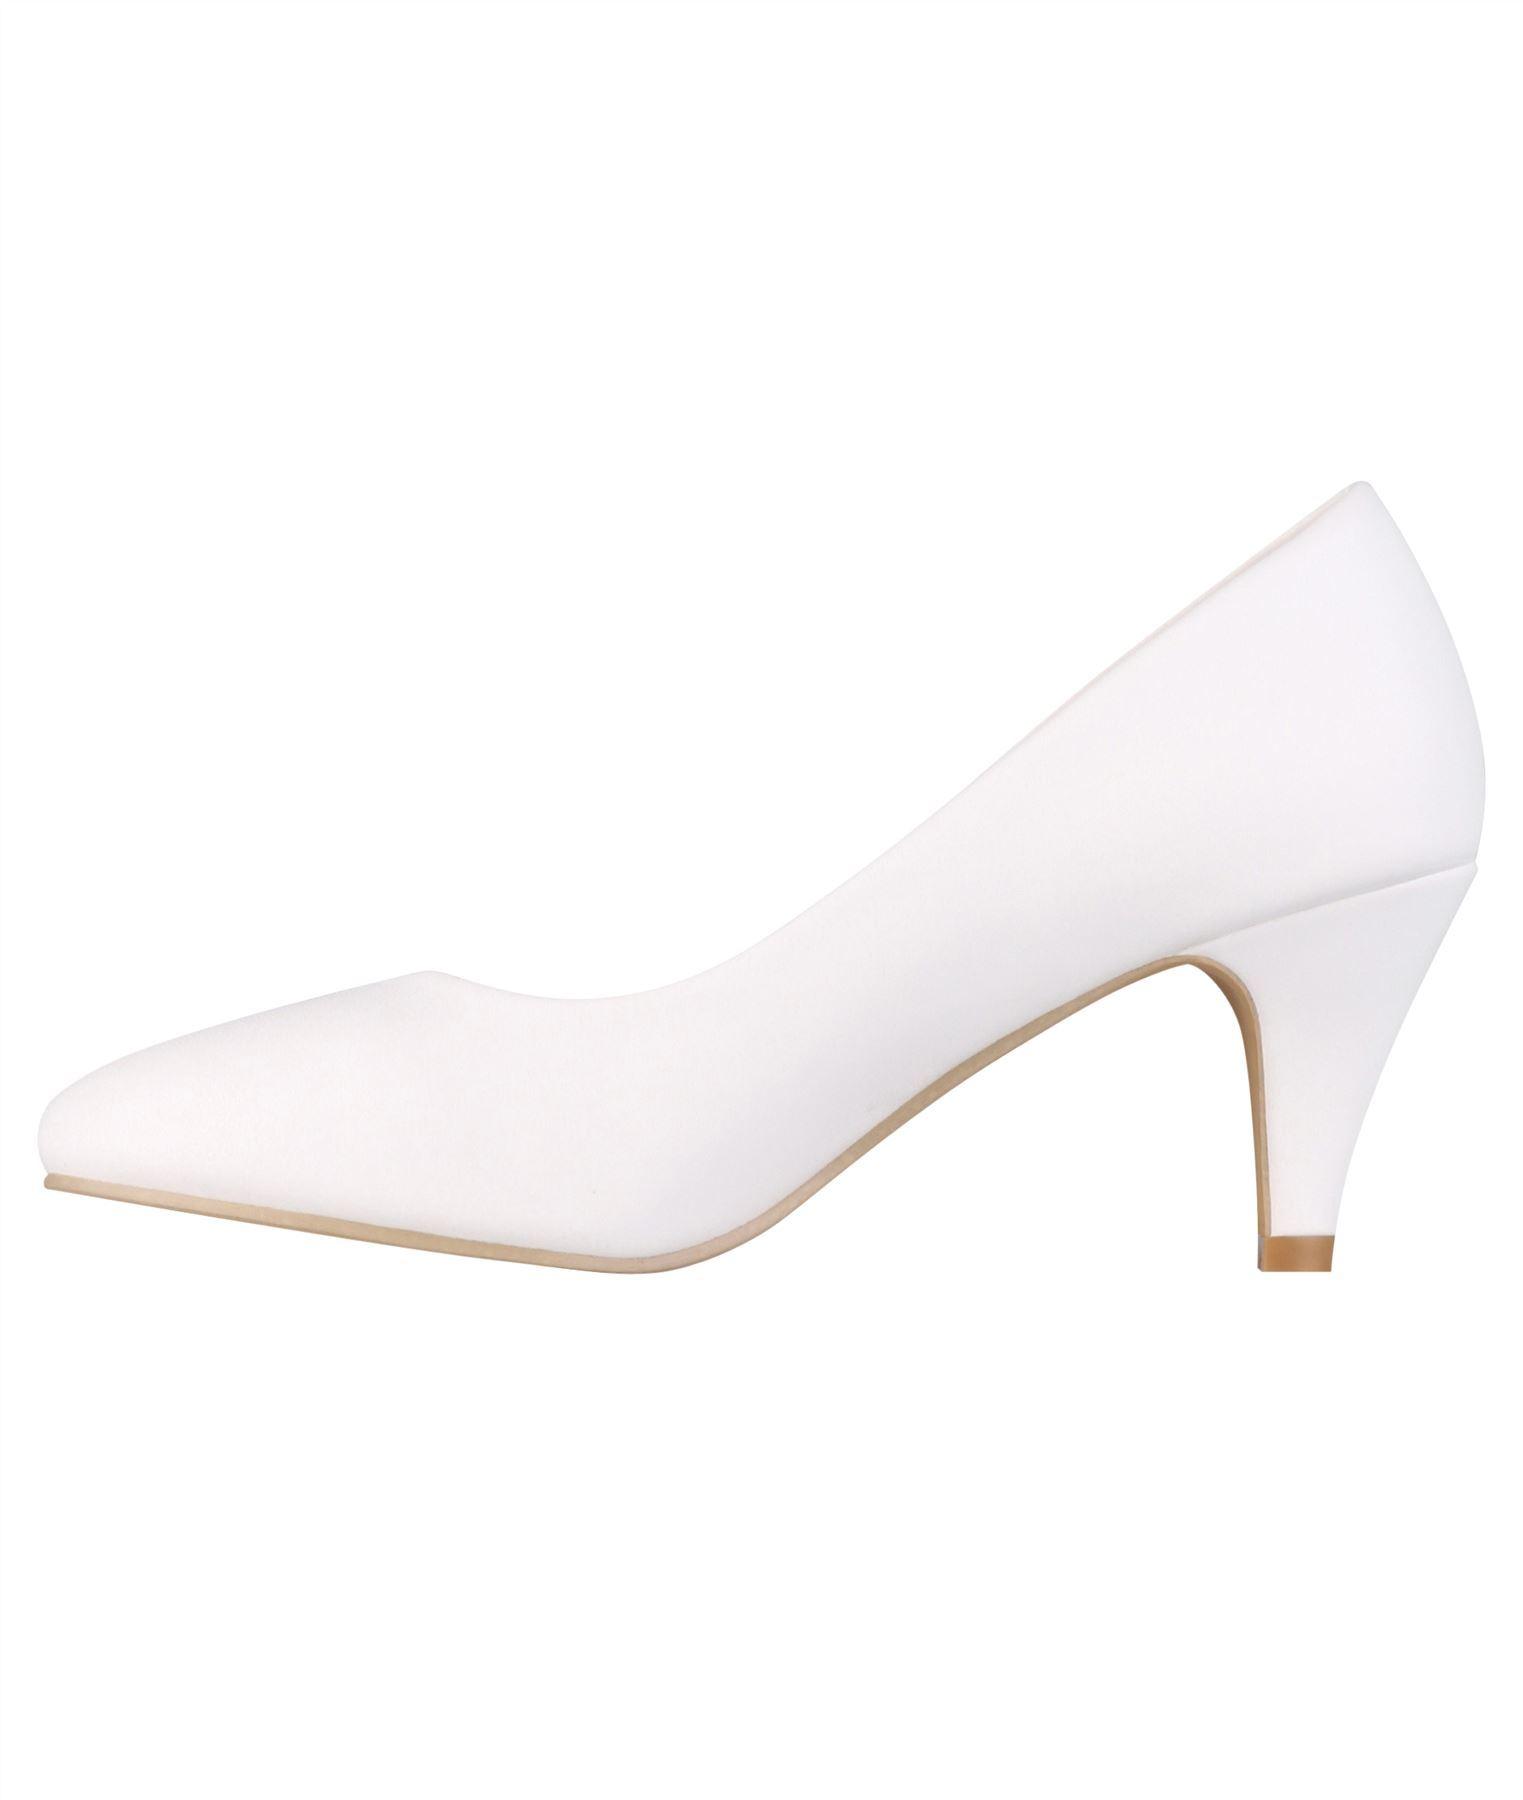 Womens-Ladies-Mid-Heel-Court-Shoes-Slip-On-Low-Kitten-Heels-Pumps-Matte-Size-3-8 thumbnail 26